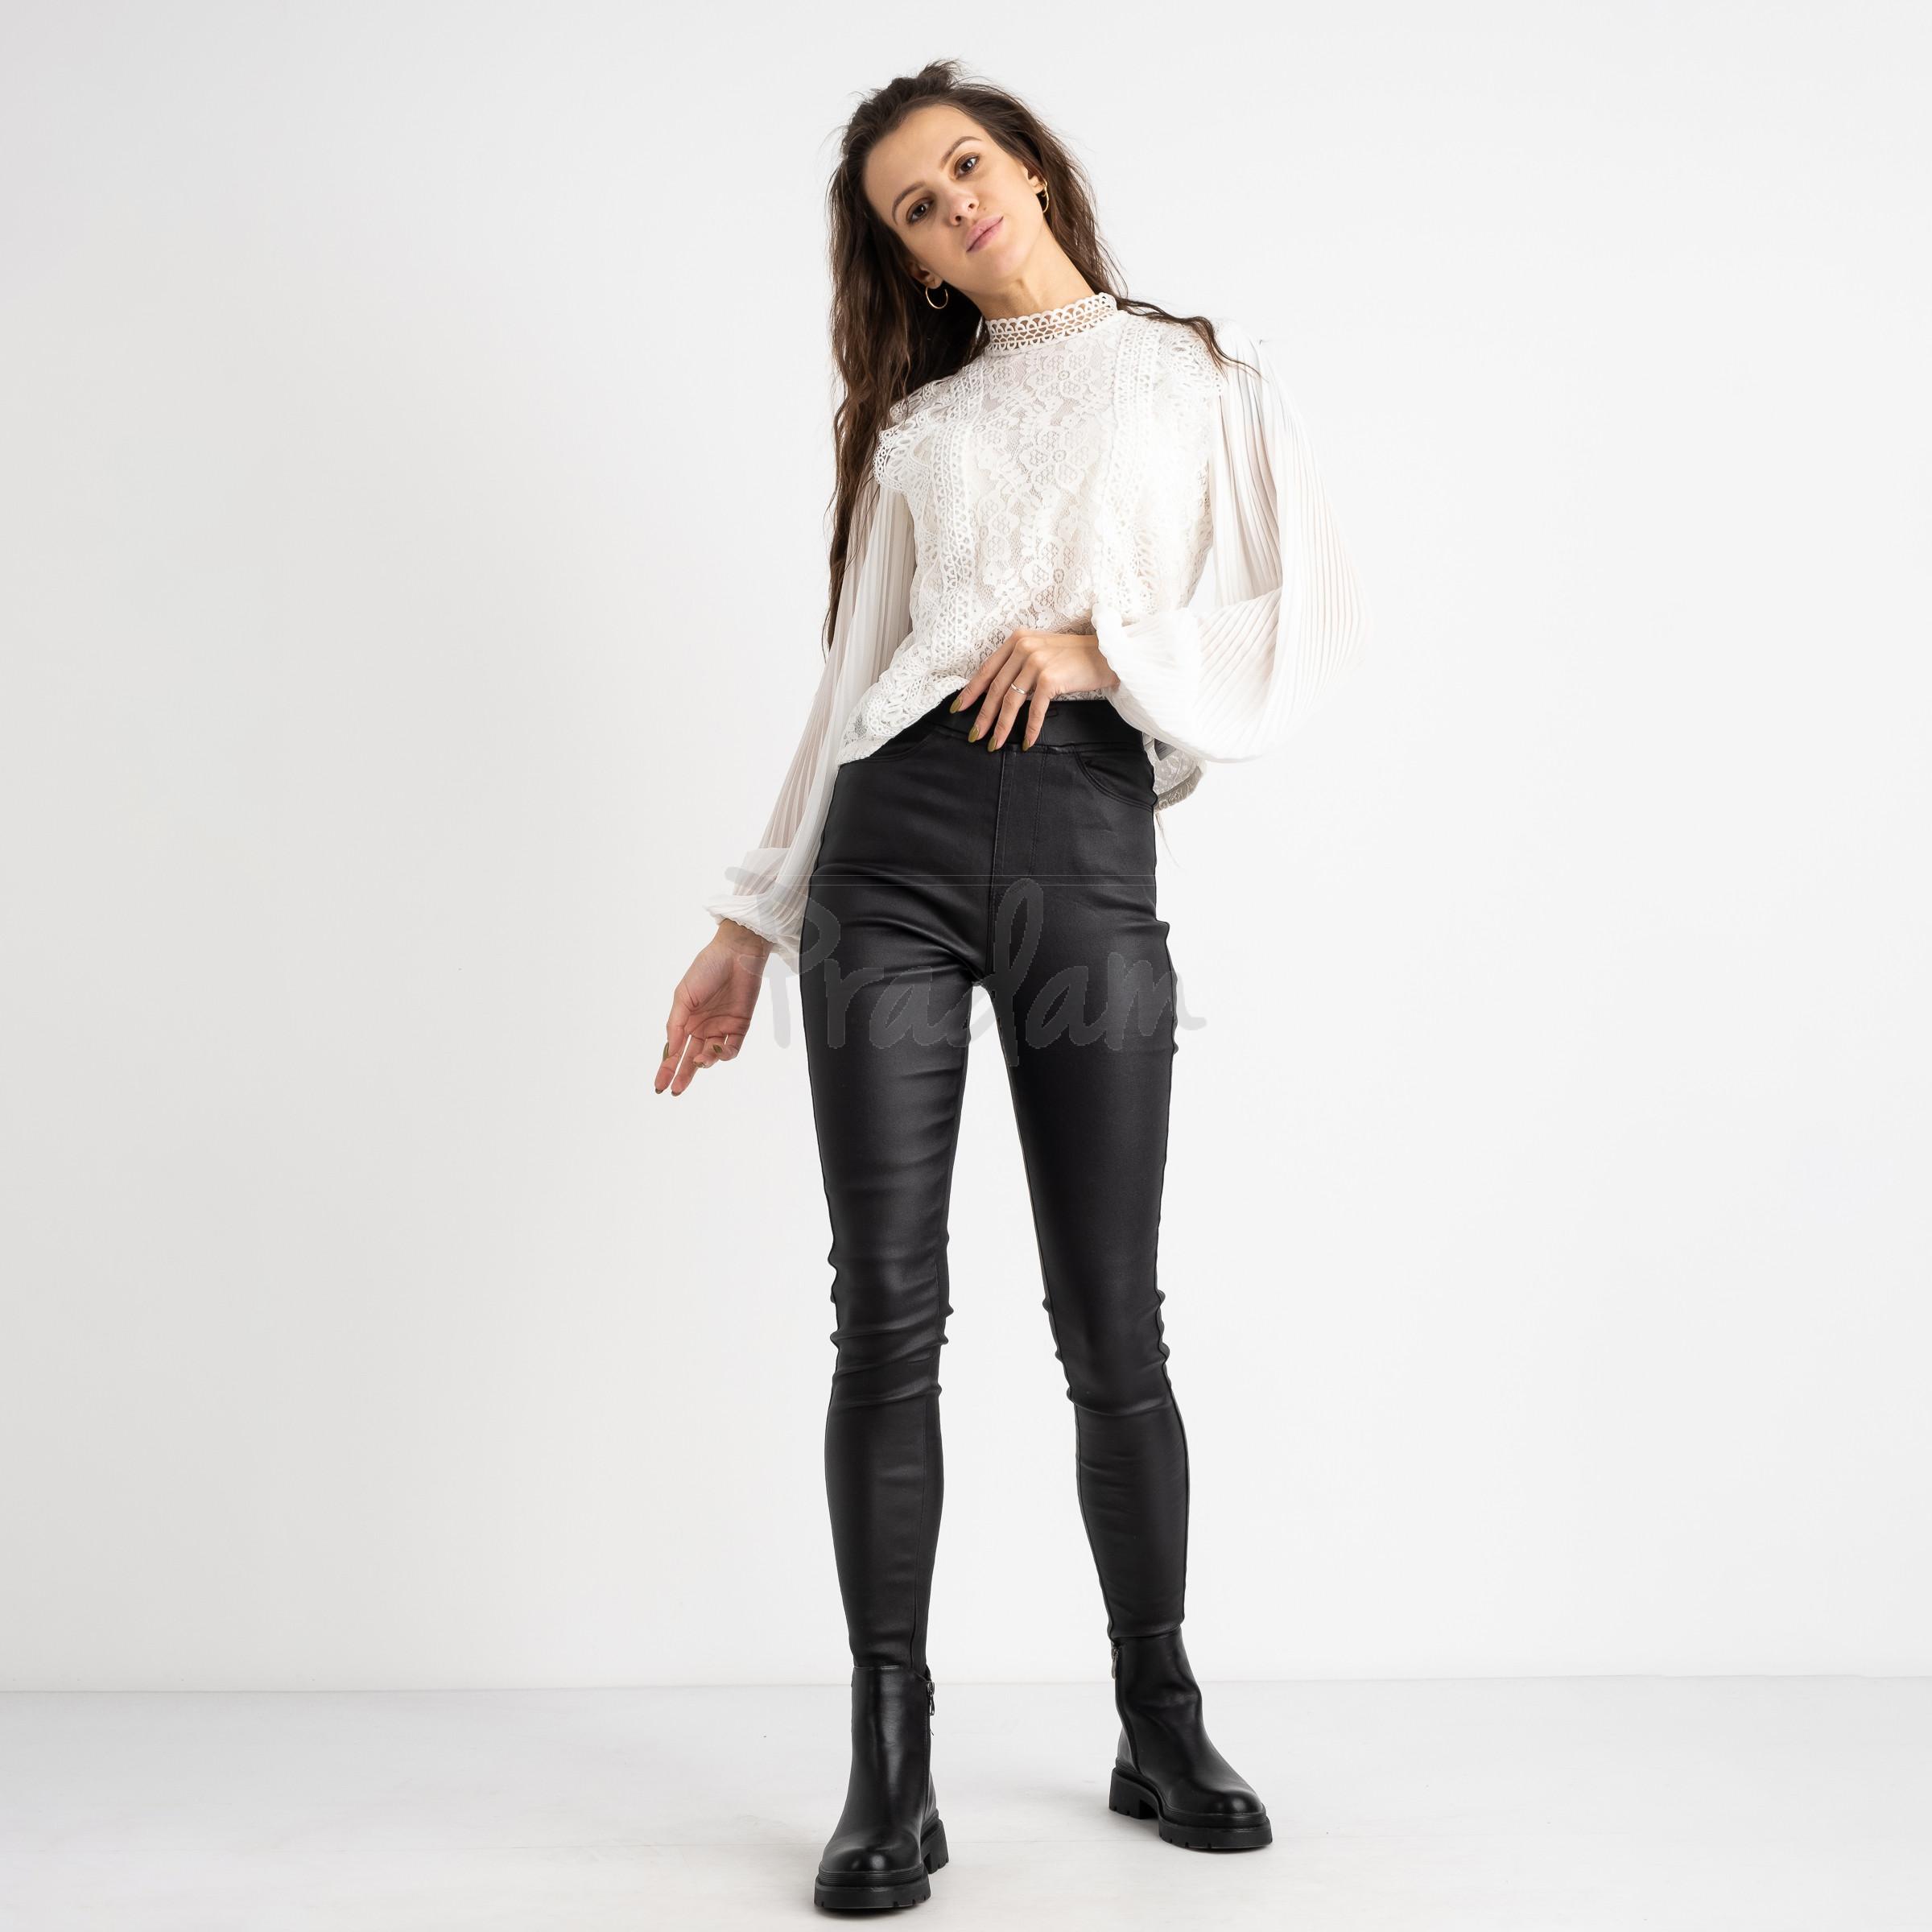 0784 Forest jeans черные брюки из экокожи женские на байке (6 ед.размеры: 25.26.27.28.29.30)